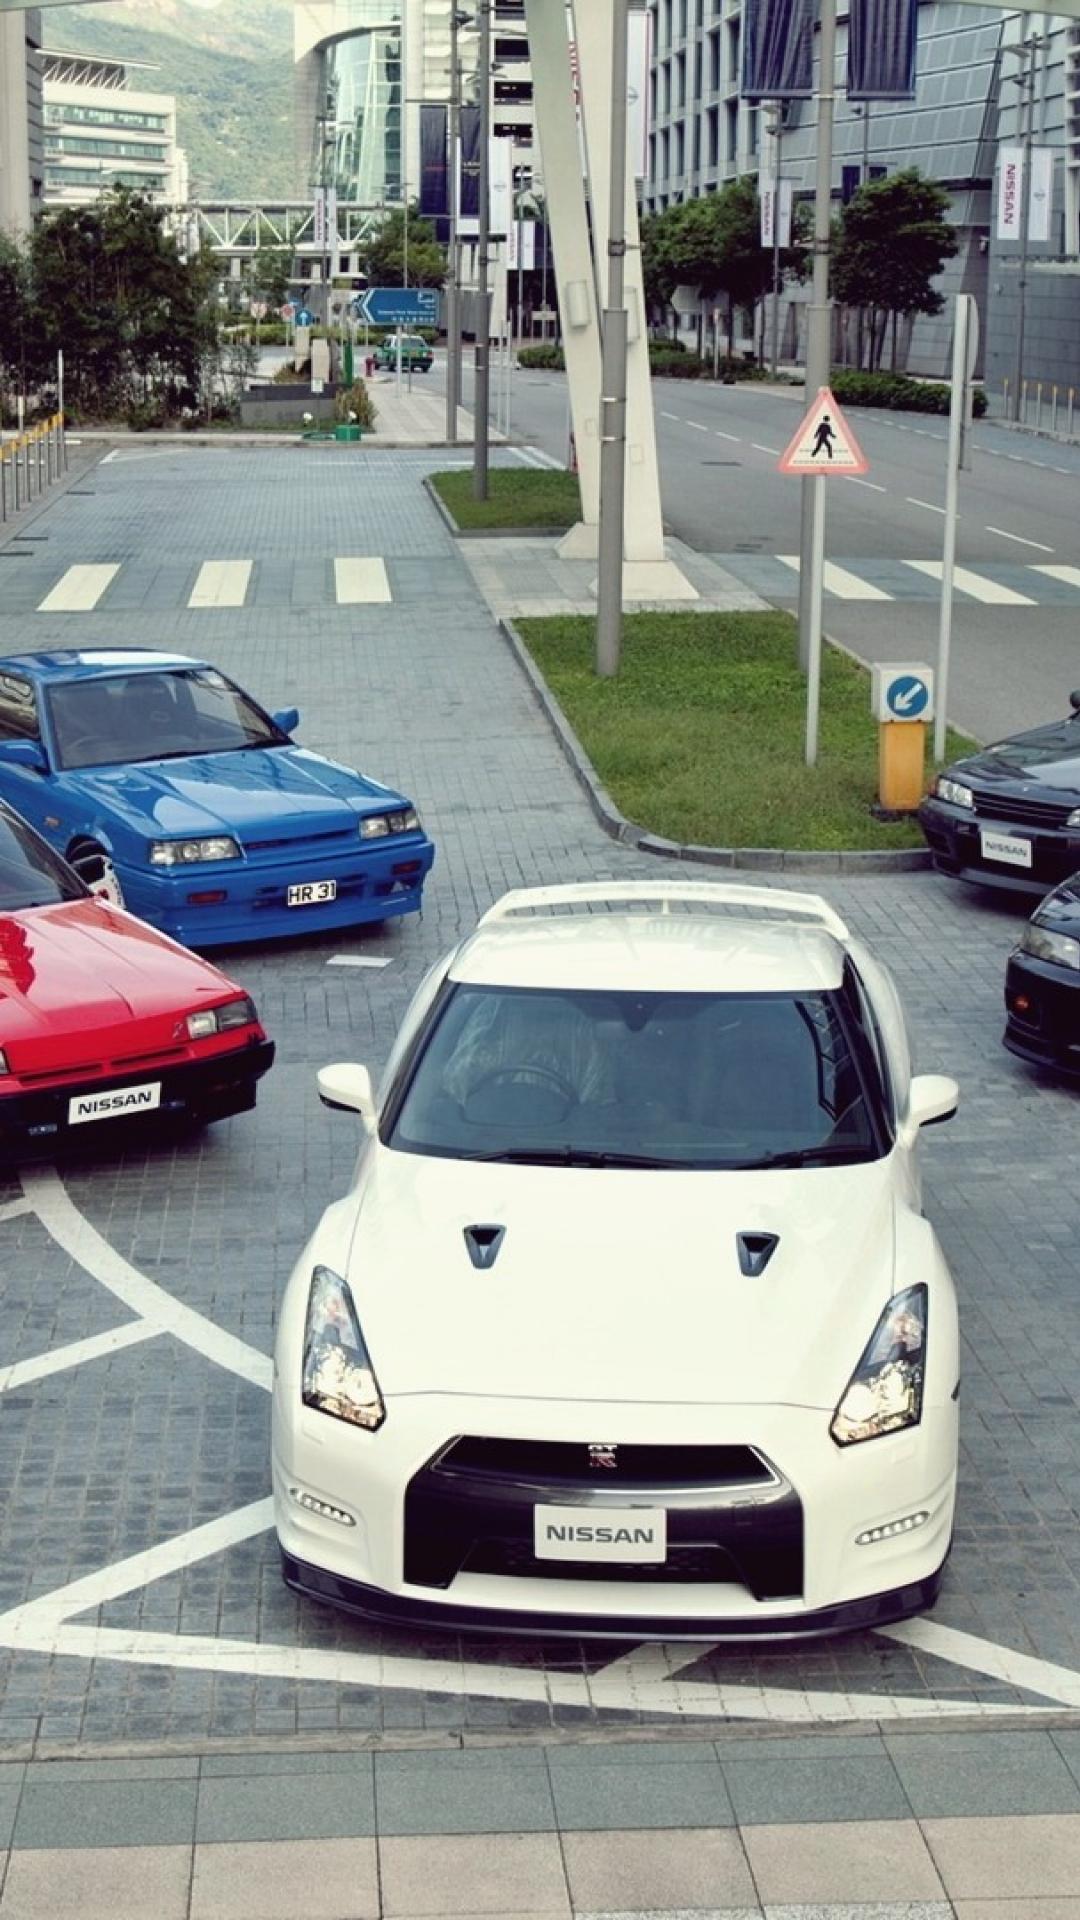 Nissan Japan Gtr Wallpapers Top Free Nissan Japan Gtr